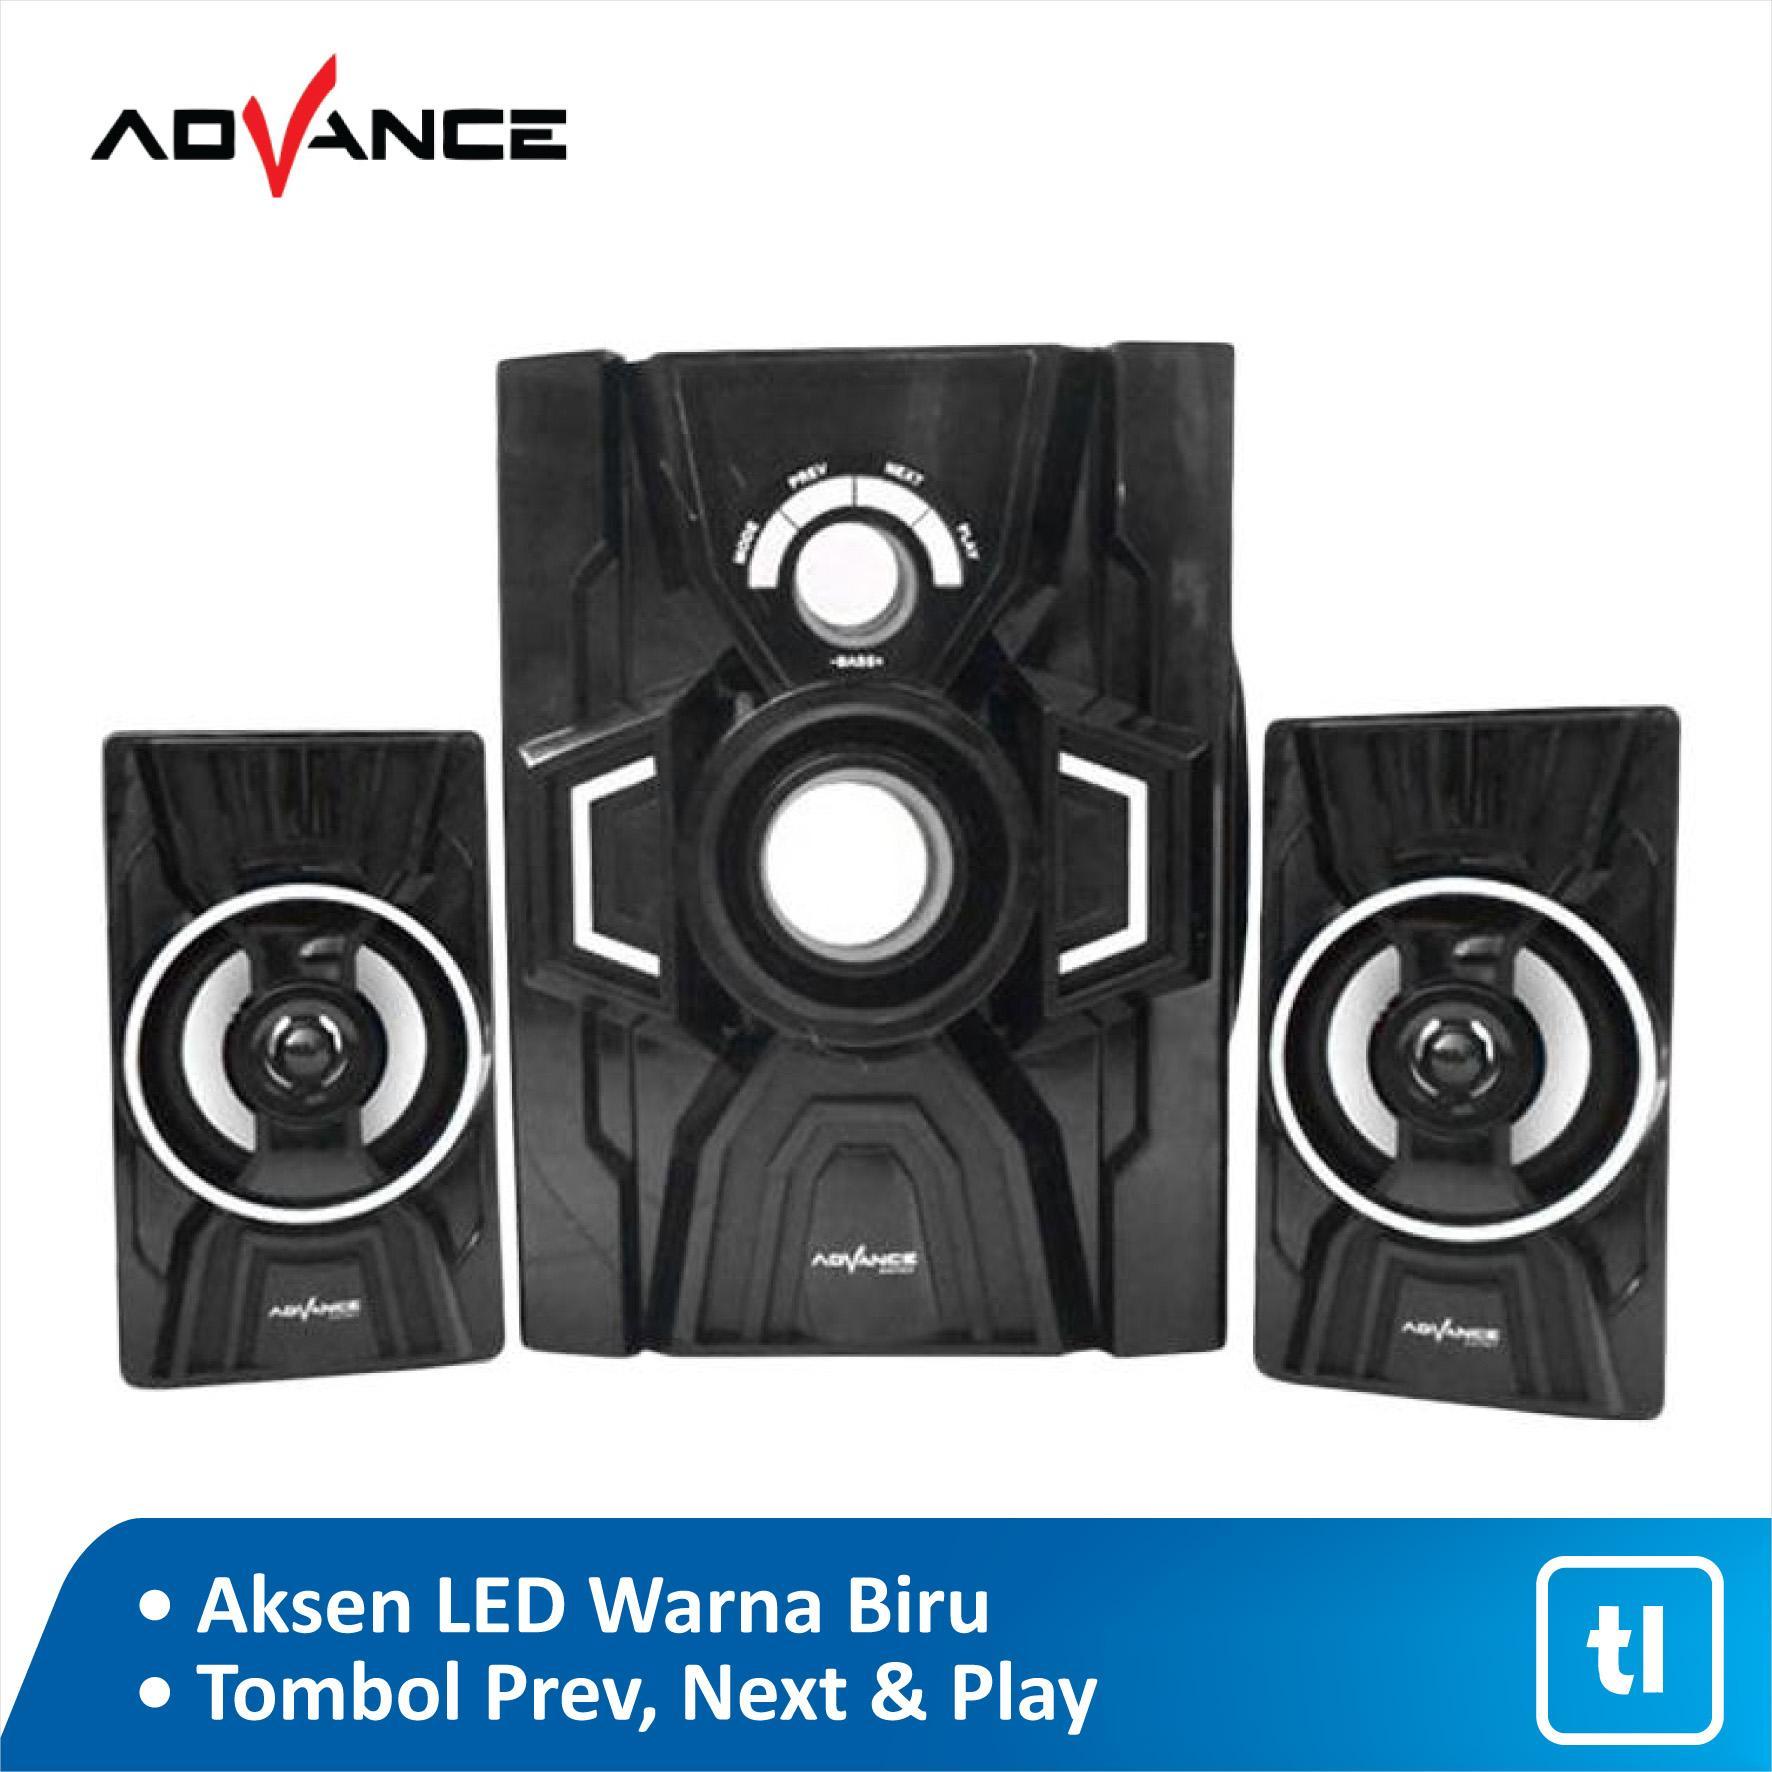 Rp 329.900. Speaker Aktif Advance M20BT Bluetooth / Speaker Aktif Murah / Speaker Aktif TerbaikIDR329900